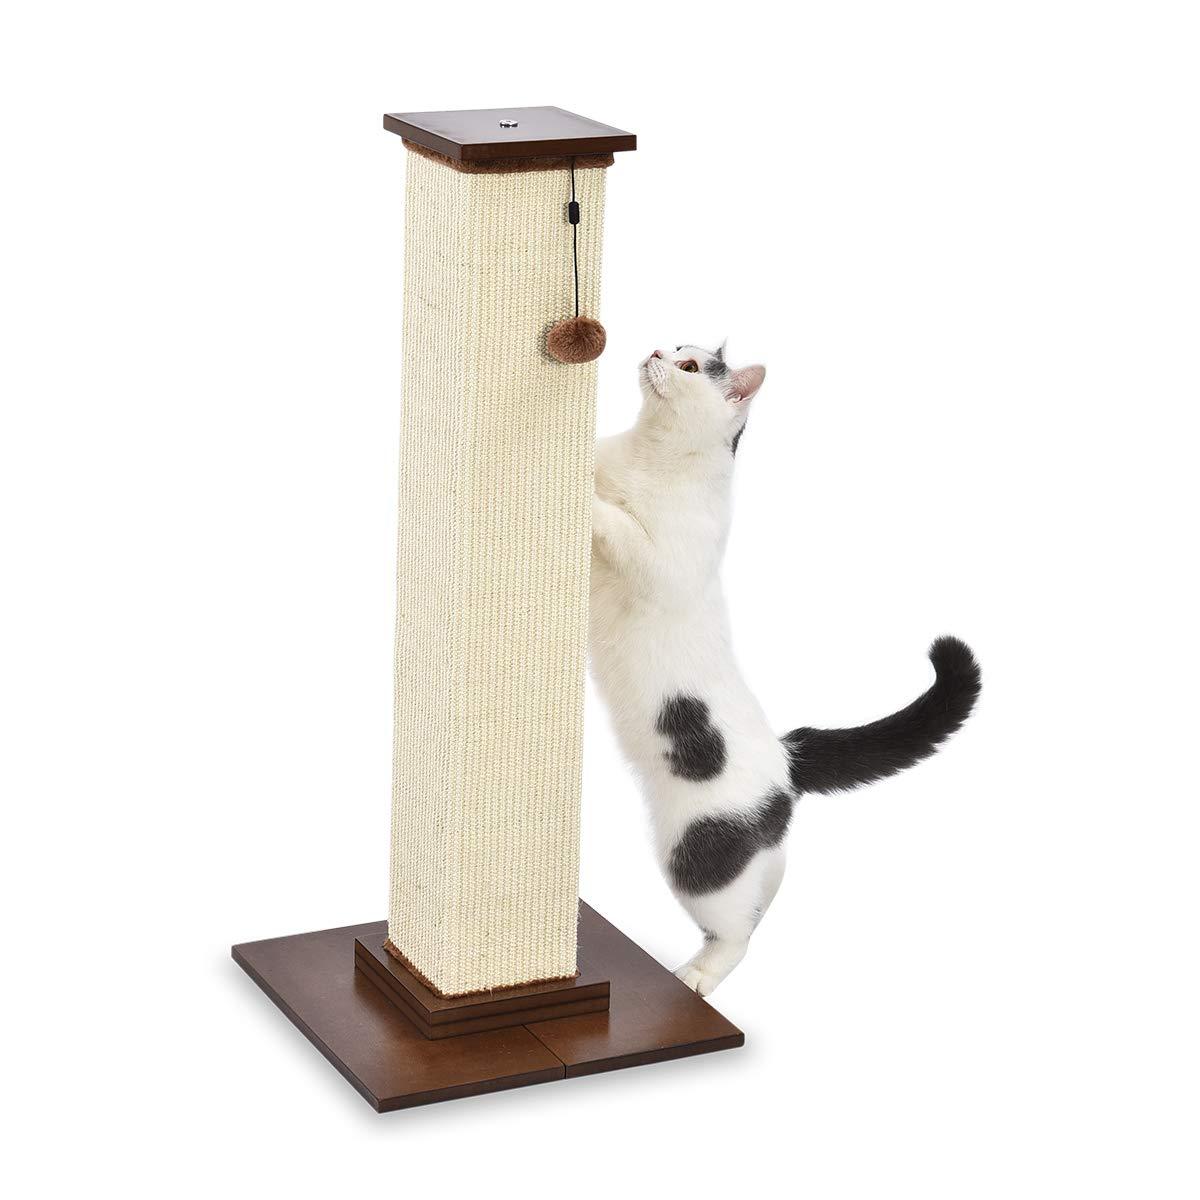 AmazonBasics Large Premium Tall Cat Scratching Post - 16 x 35 x 16 Inches, Wood by AmazonBasics